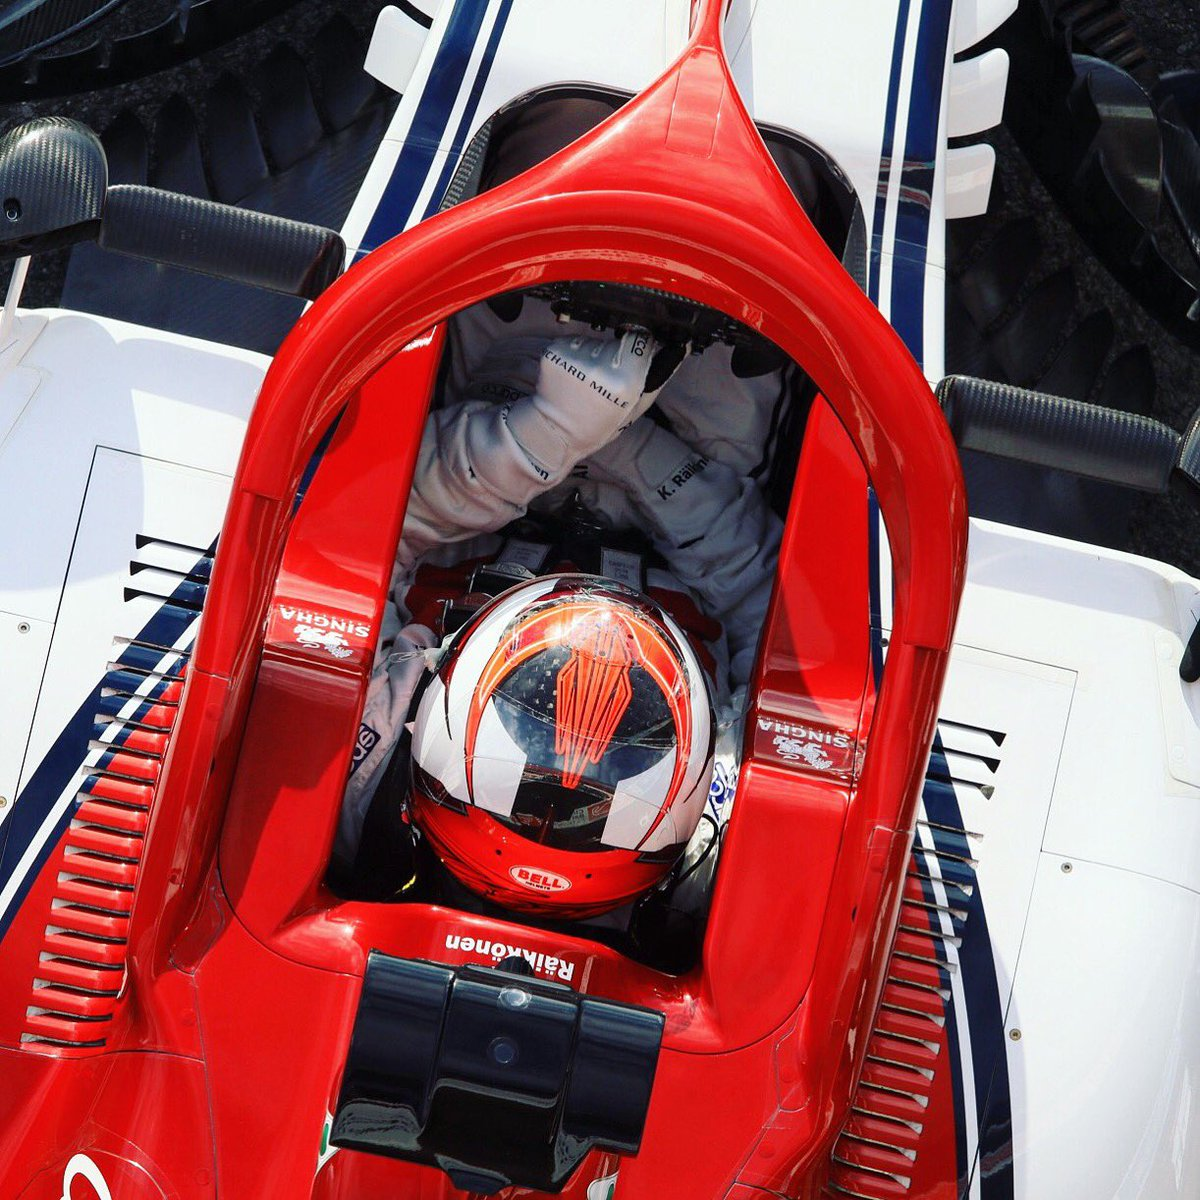 Kimi will be back in the office for day 2&4, week2 #F1testing #kimi #kimi7 #kimiraikkonen #iceman #Bwoah #sauberf1 #sauber  #AlfaRomeoRacing #SauberMotorsport #AlfaRomeoSauberF1Team @alfaromeoracing  @Circuitcat_eng #F1testdays #f1testdays2019 #Formula1 #F1 @f1 #cmoref1 @CMoreF1